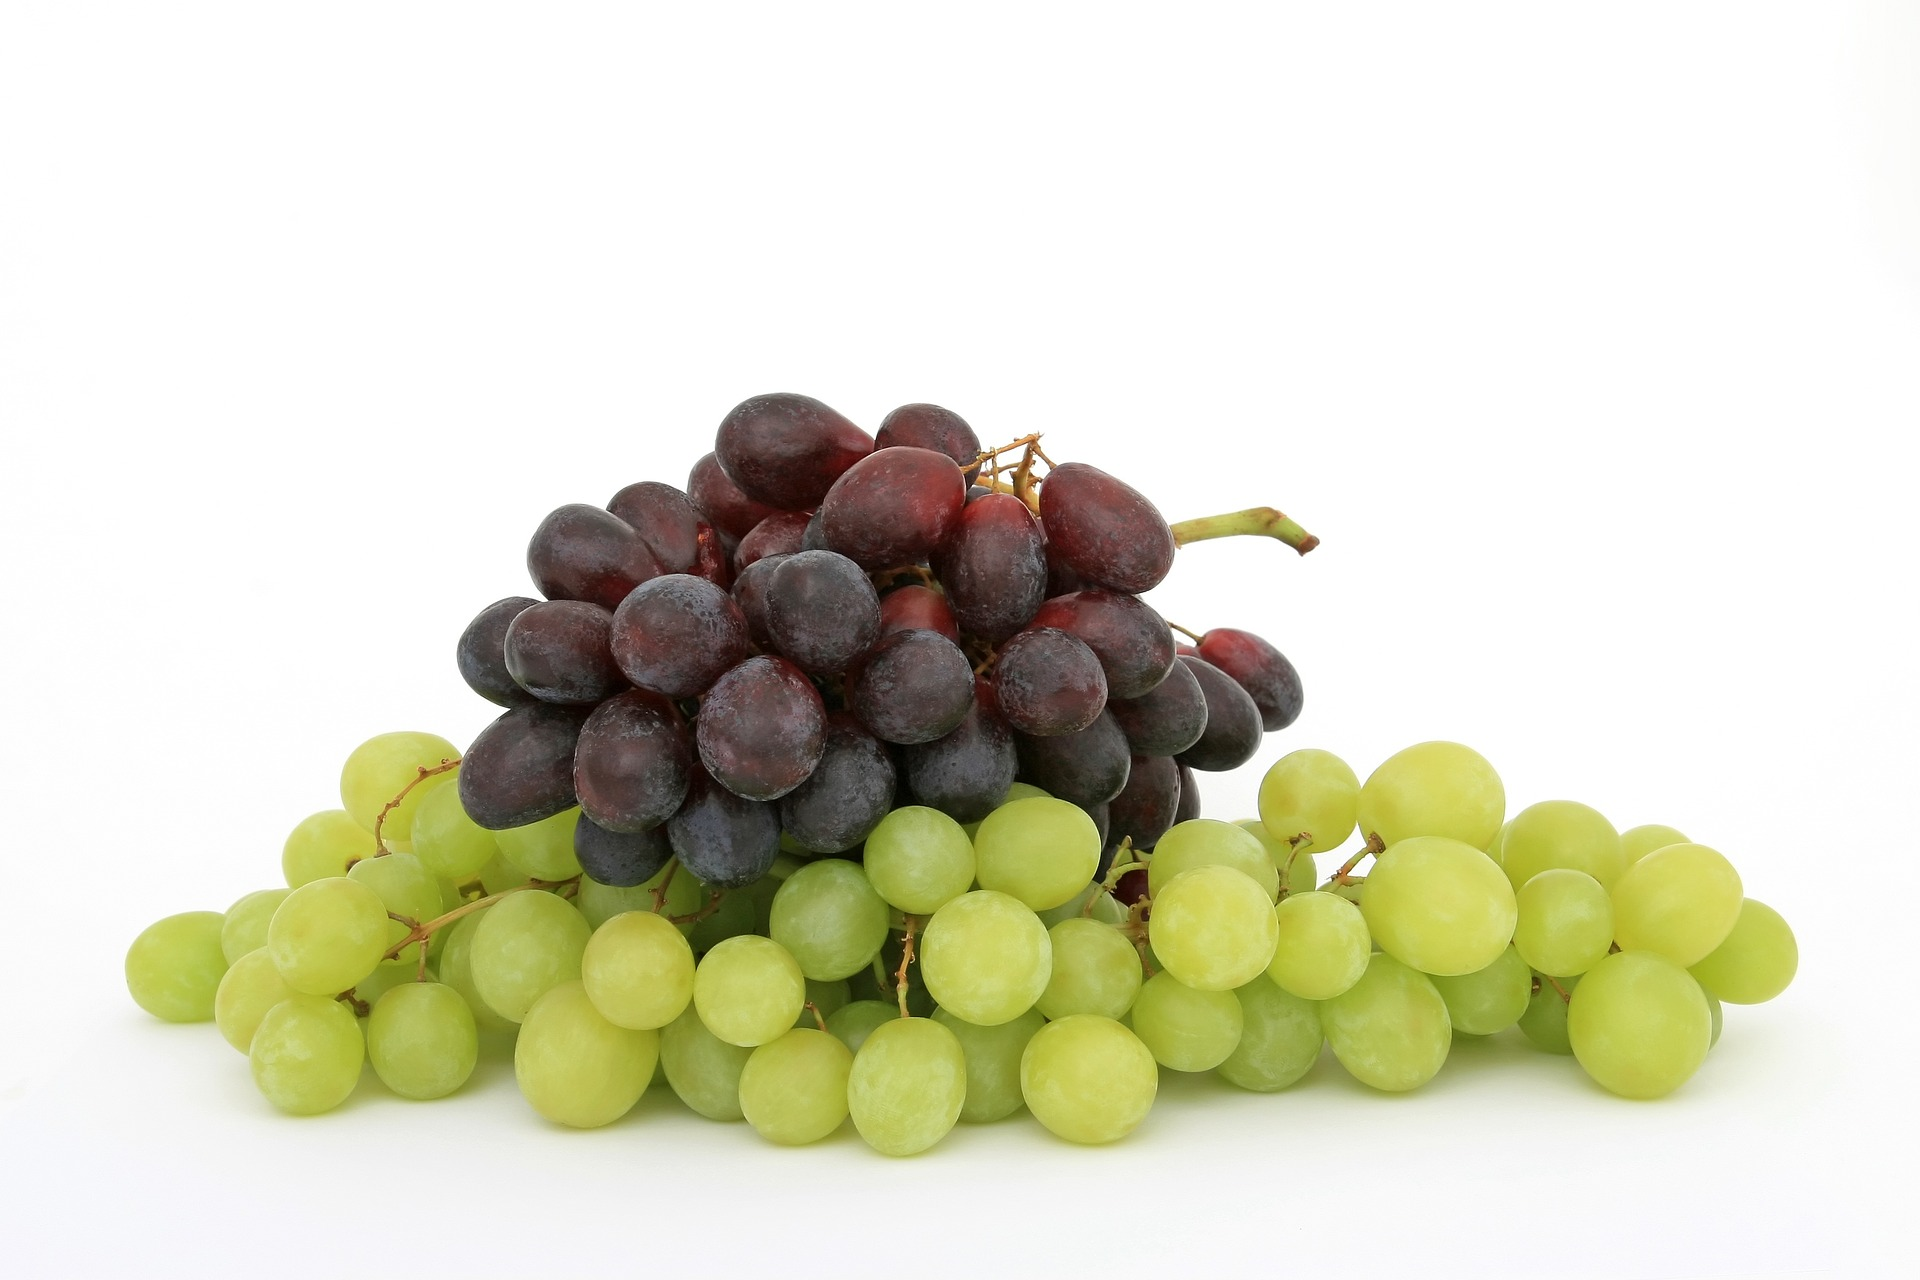 Bele i crne sorte grozdja